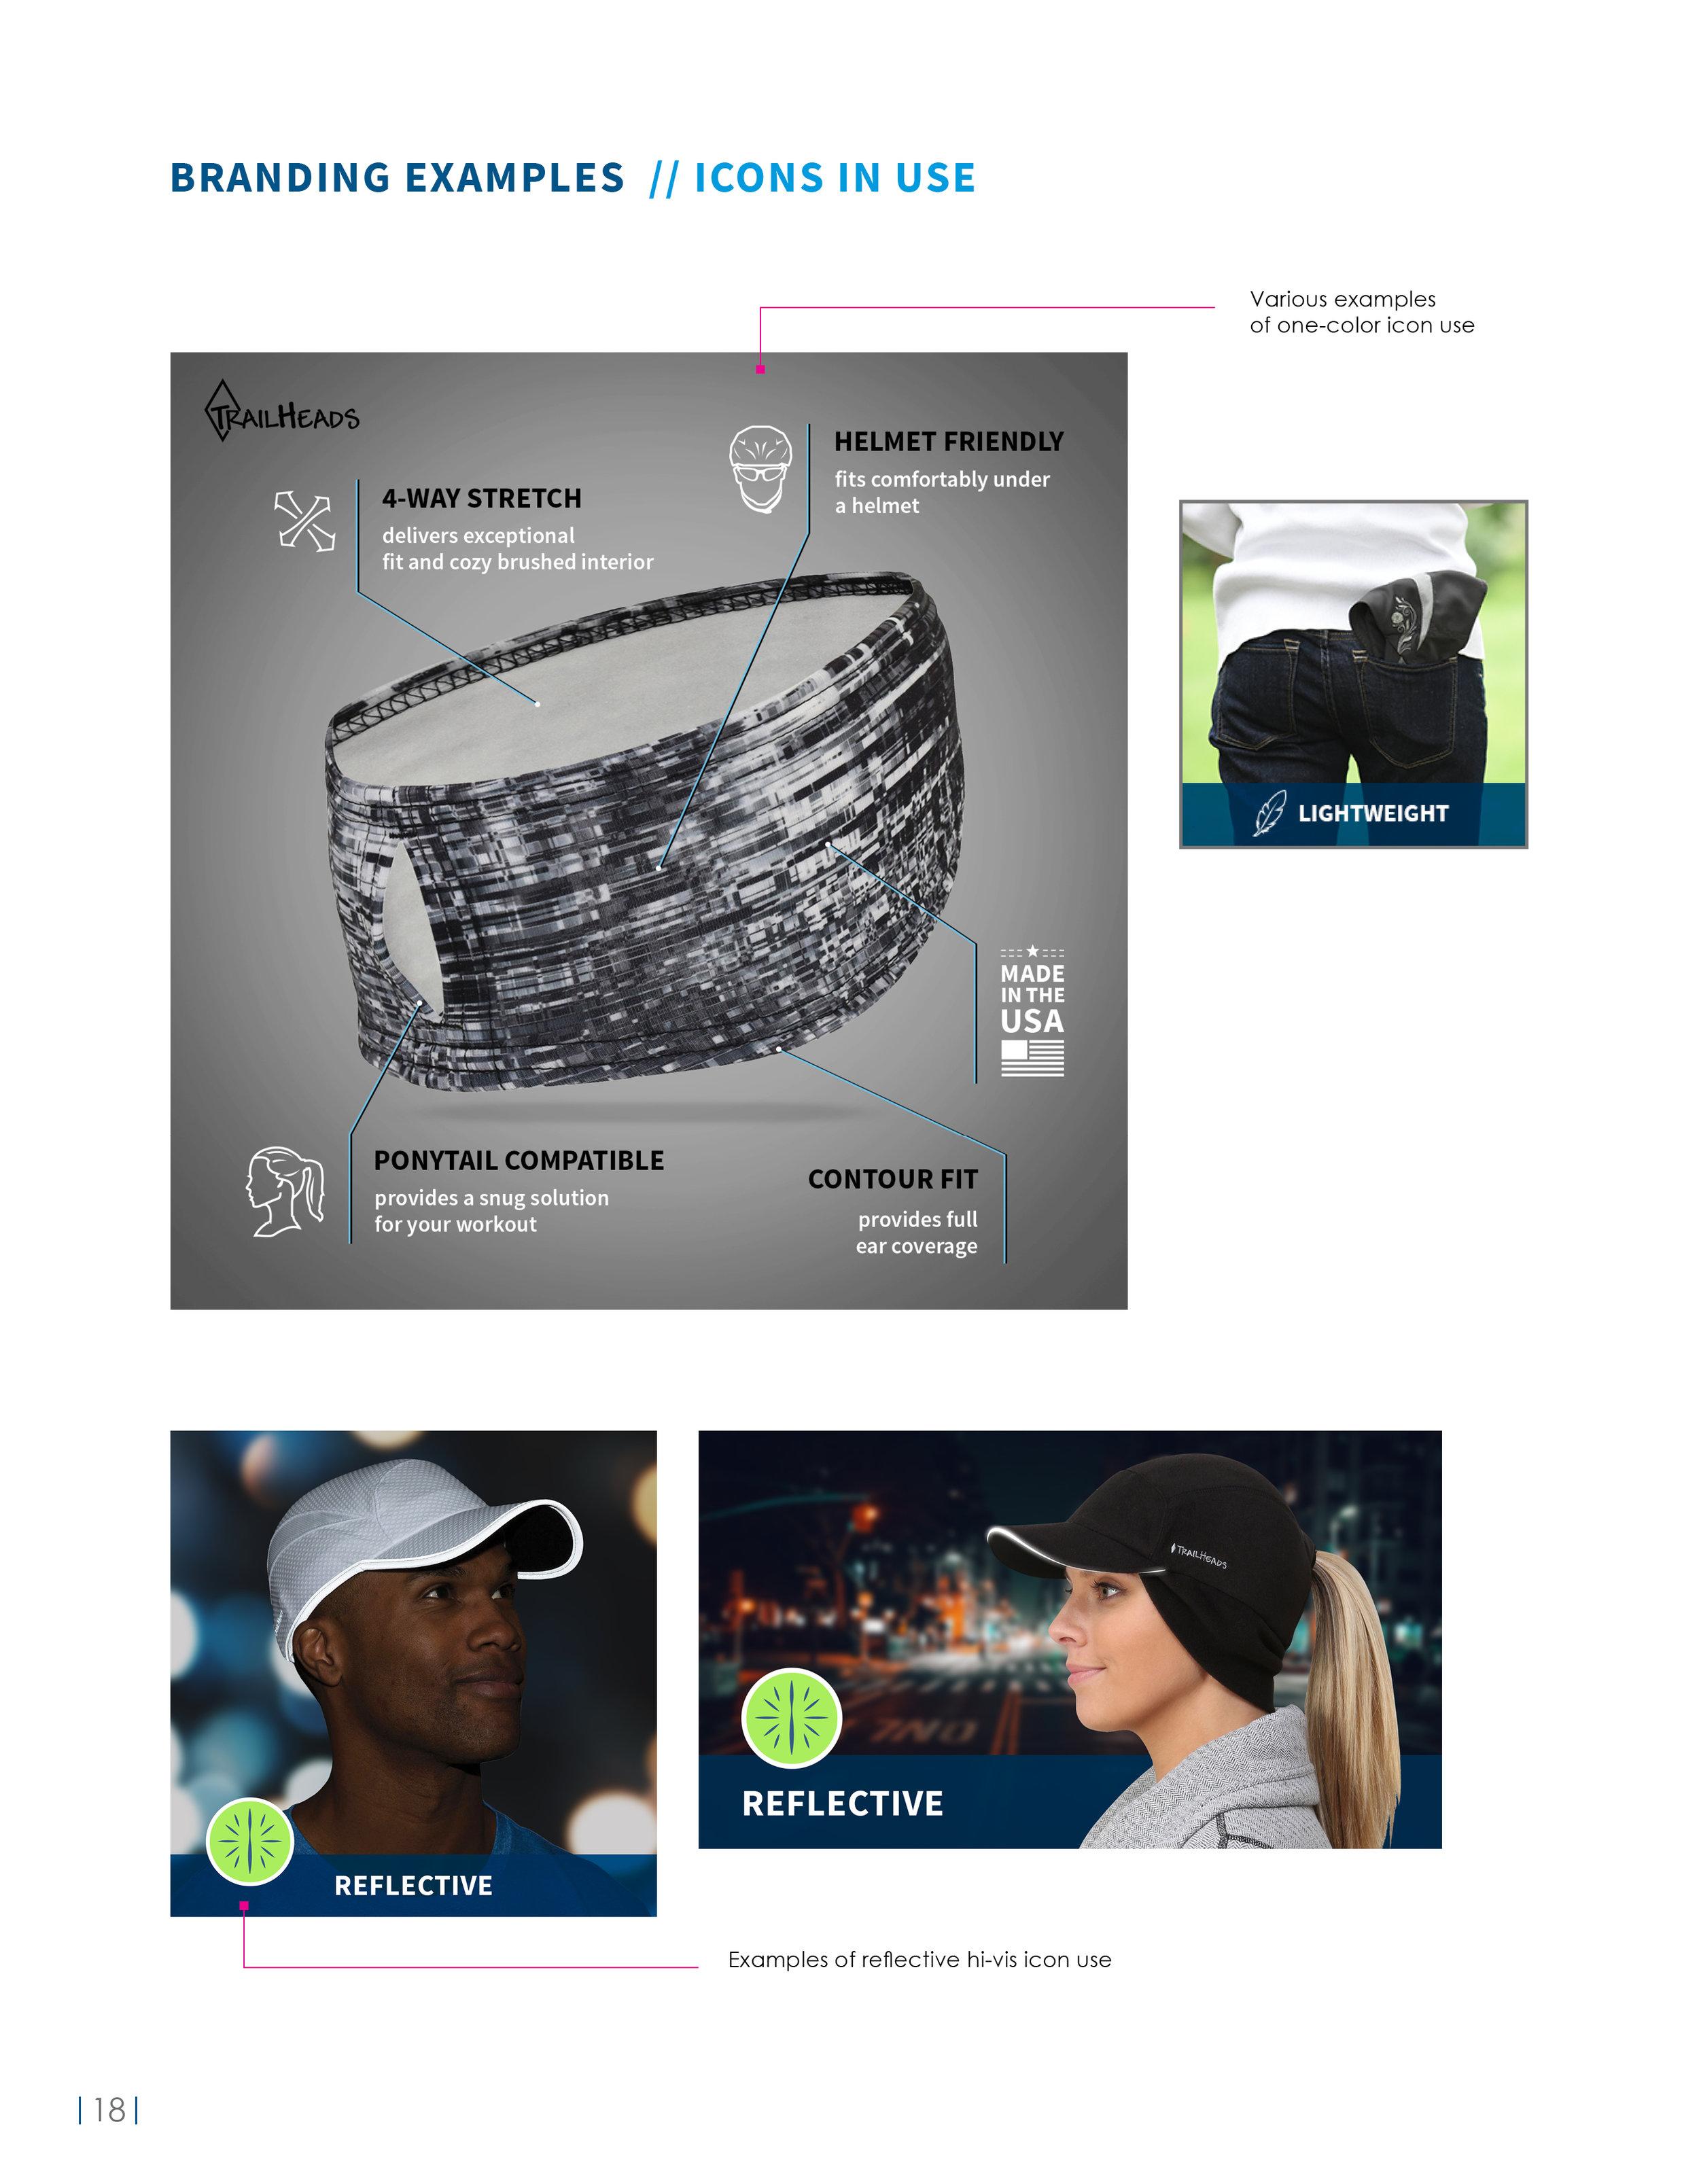 apparel-company-brand-guidelines-design-by-jordan-fretz-design-118.jpg